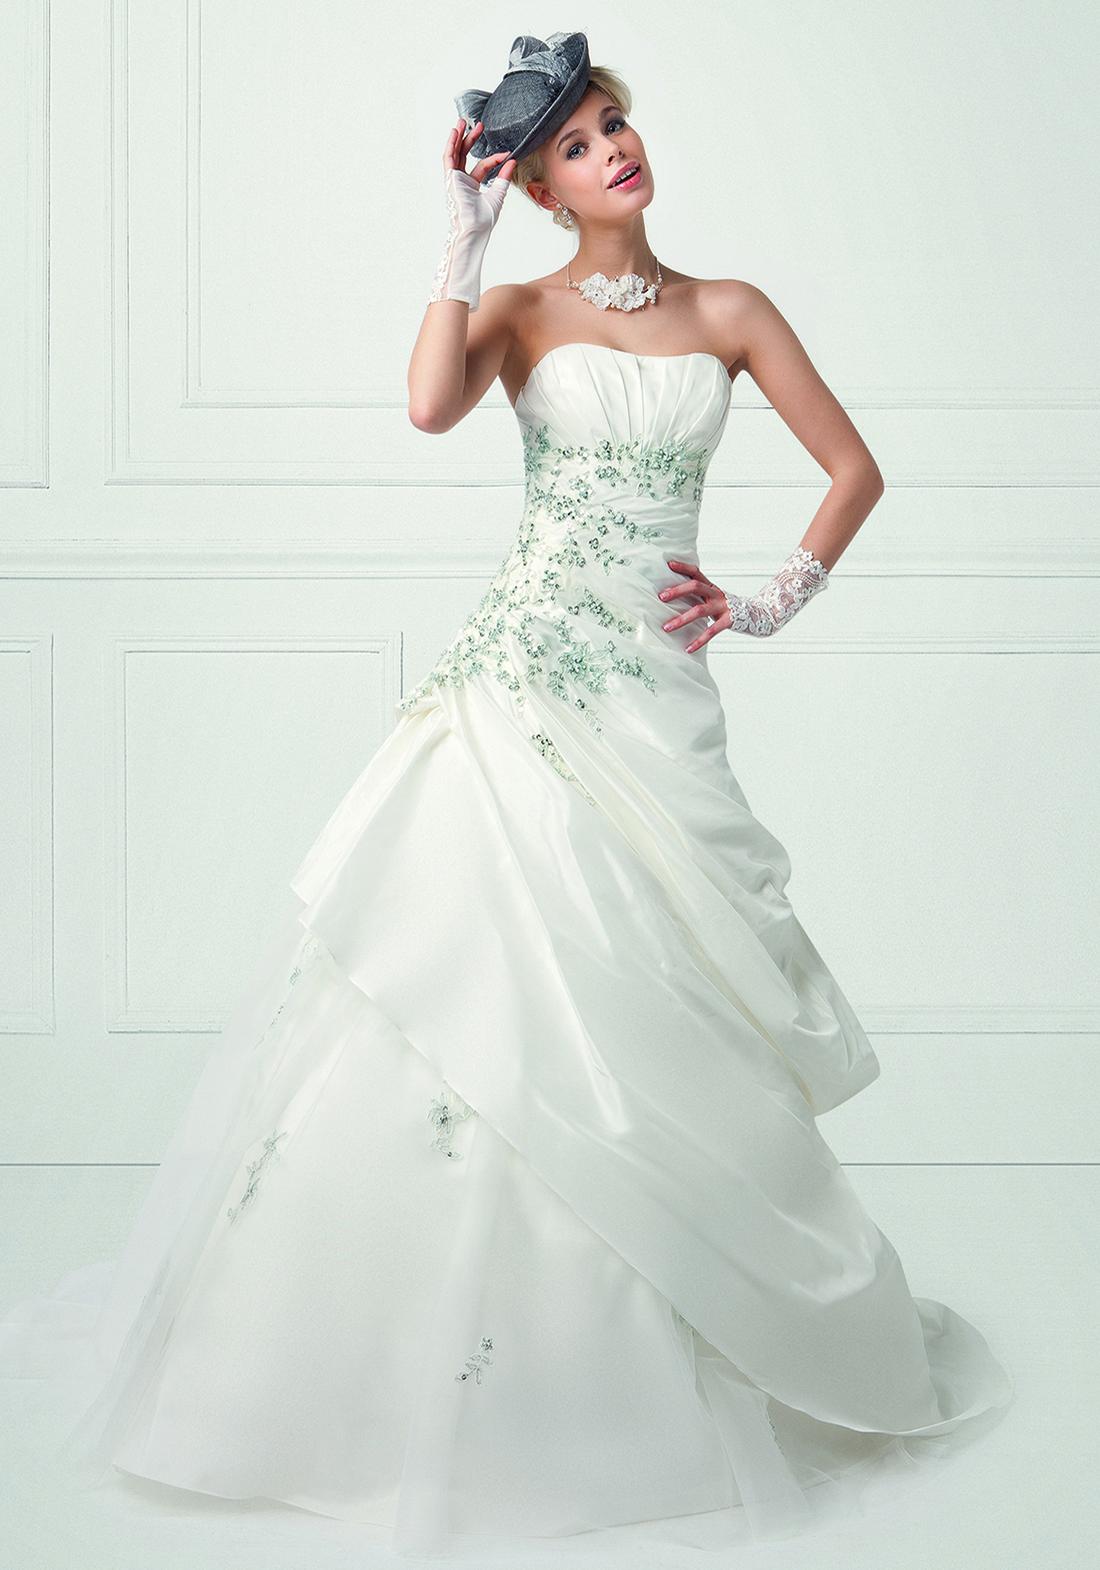 robe d marie le mariage